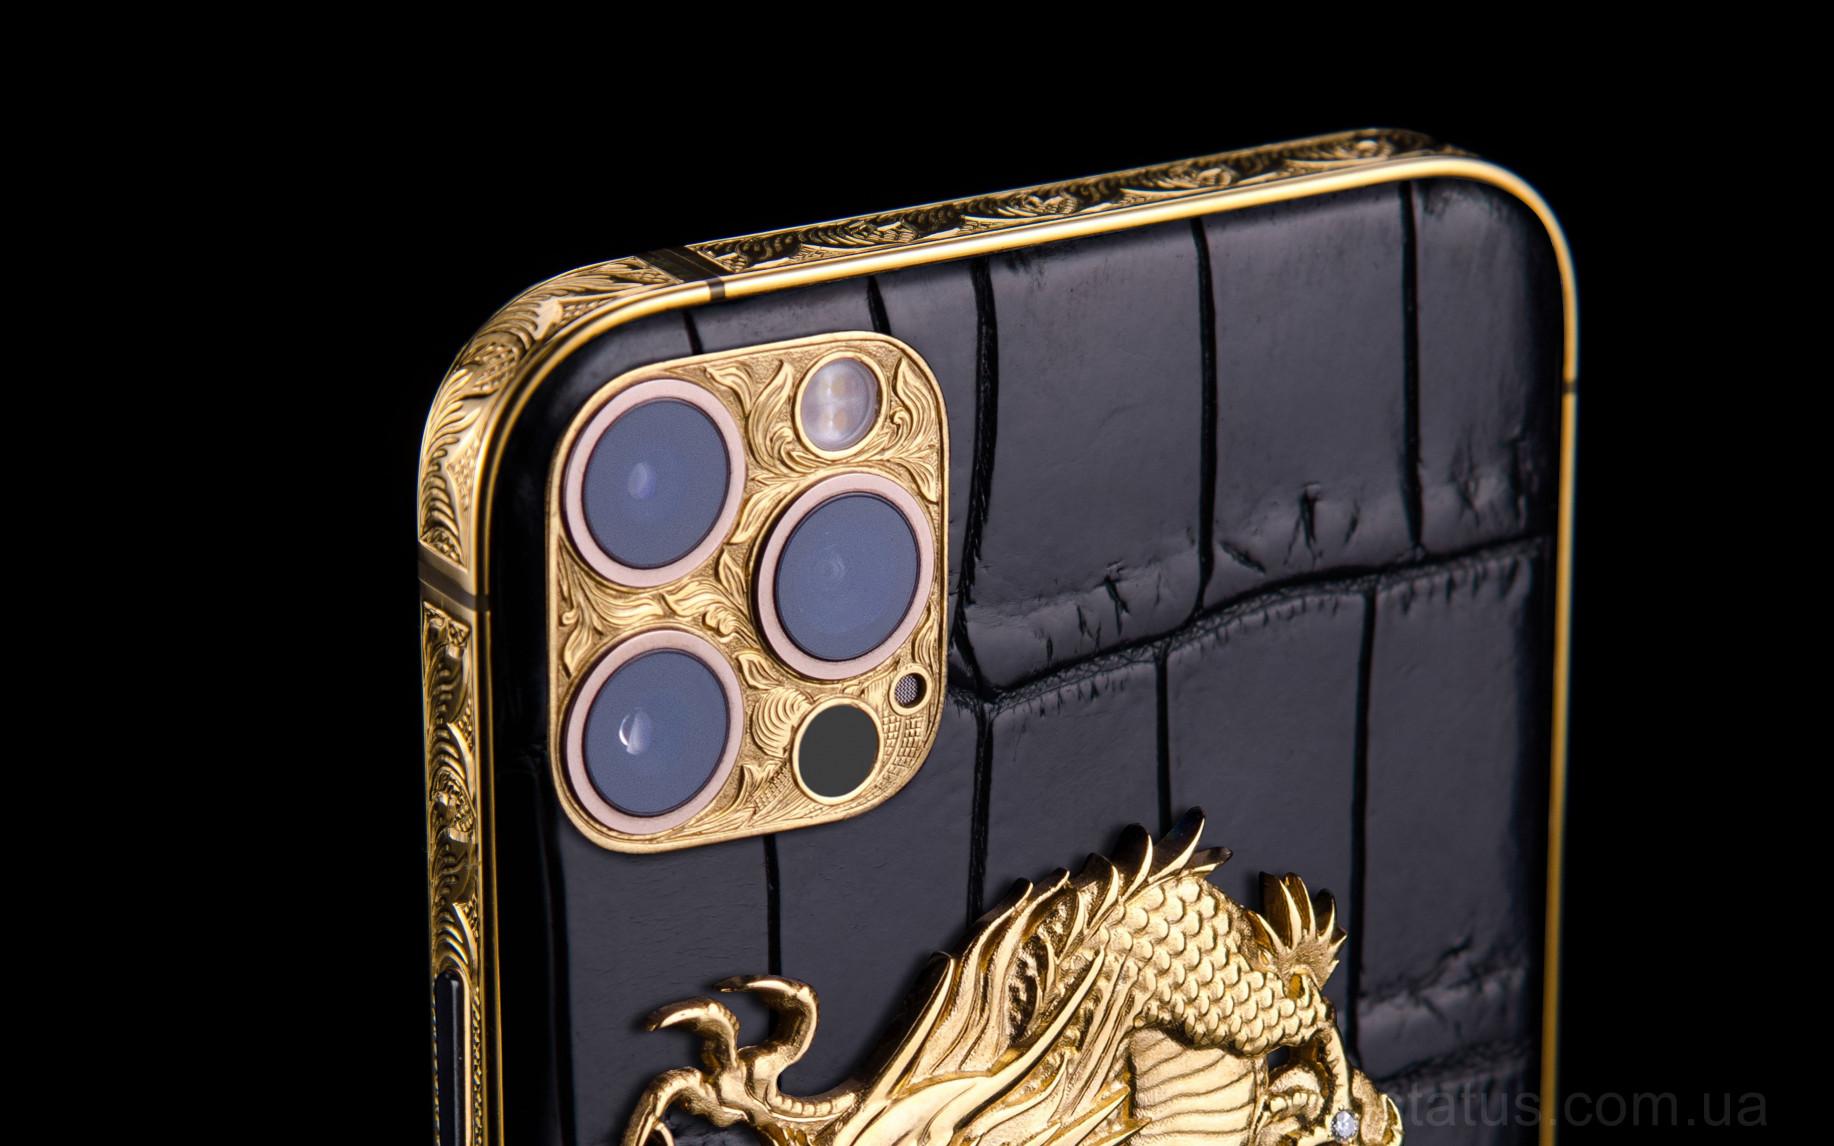 Elite Oriental Dragon IPHONE 12 PRO MAX 512 GB Oriental Dragon IPHONE 12 PRO MAX 512 GB image 28